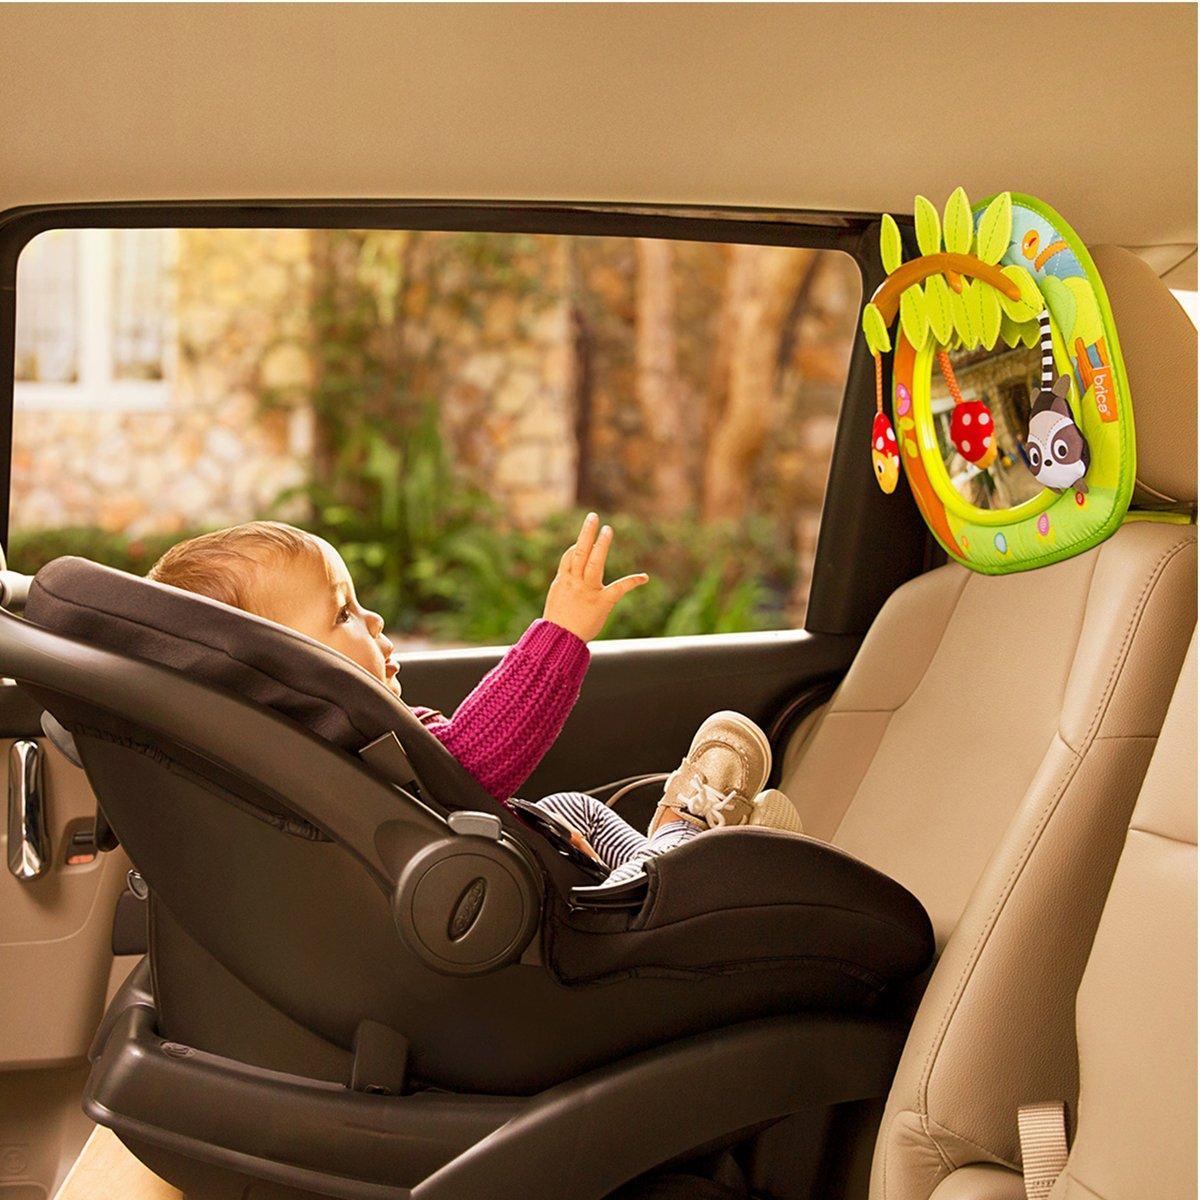 Munchkin Swing Baby Insight - Munchkin